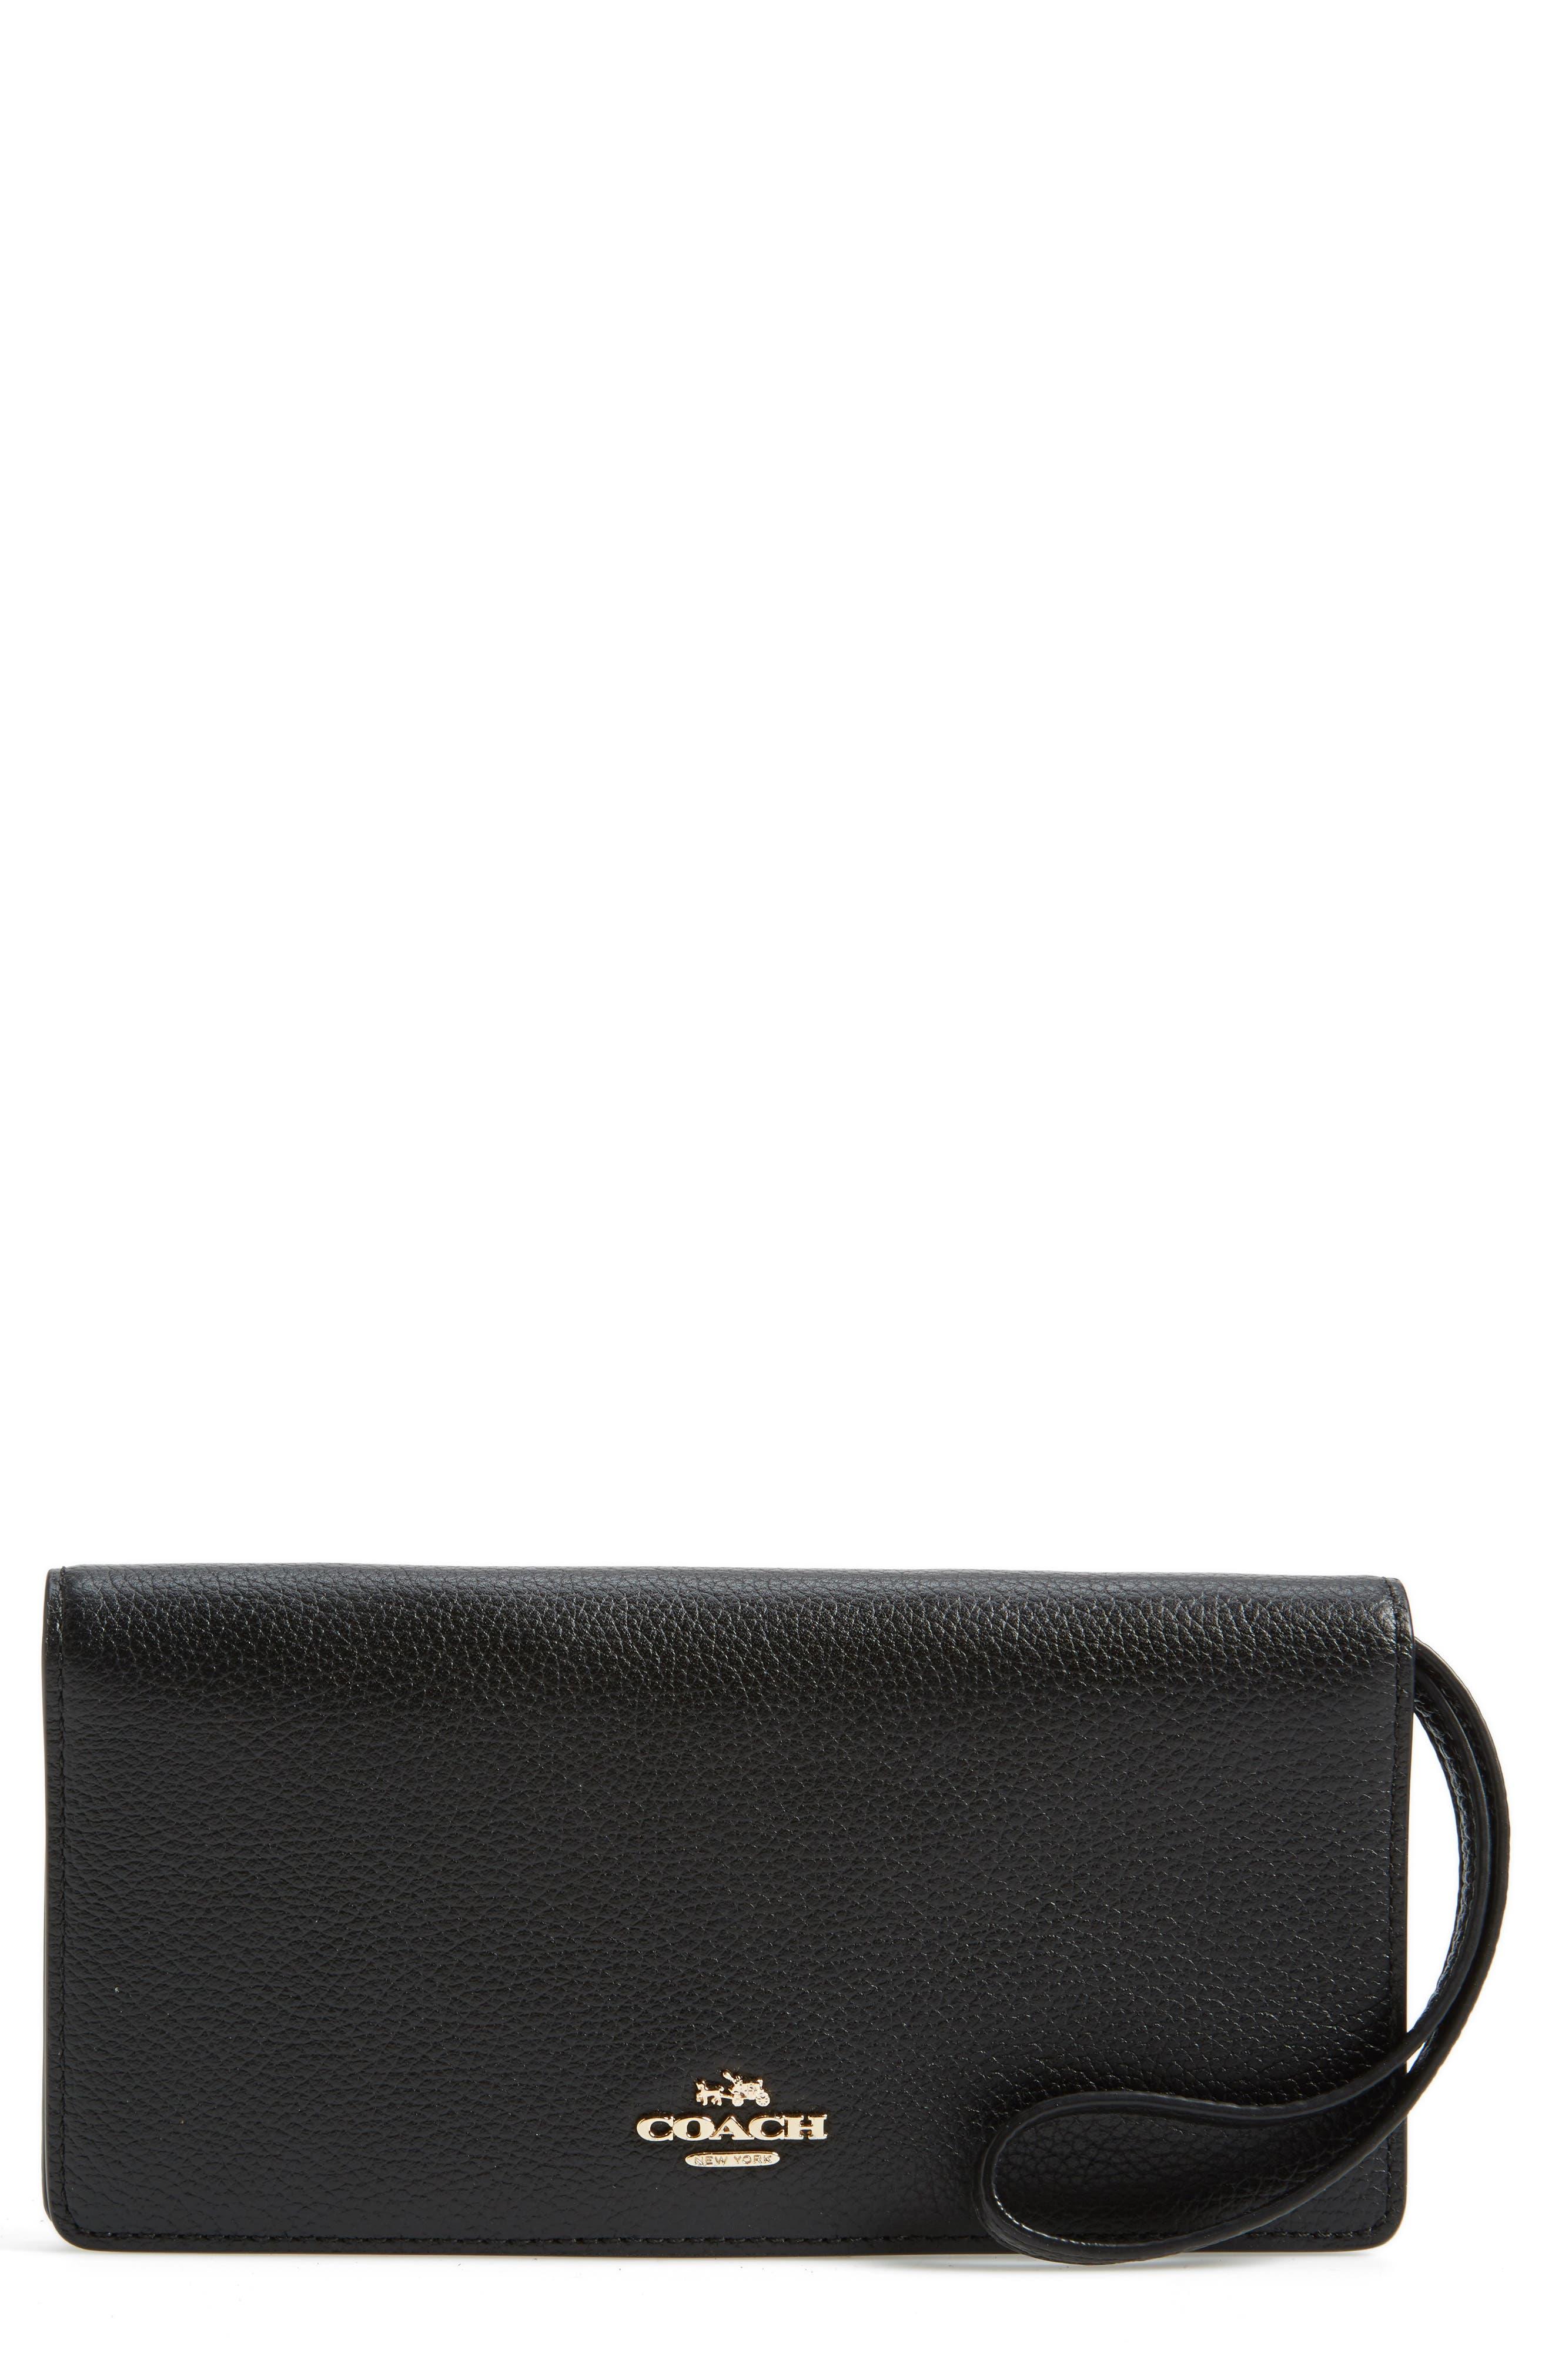 Main Image - COACH Slim Calfskin Leather Wristlet